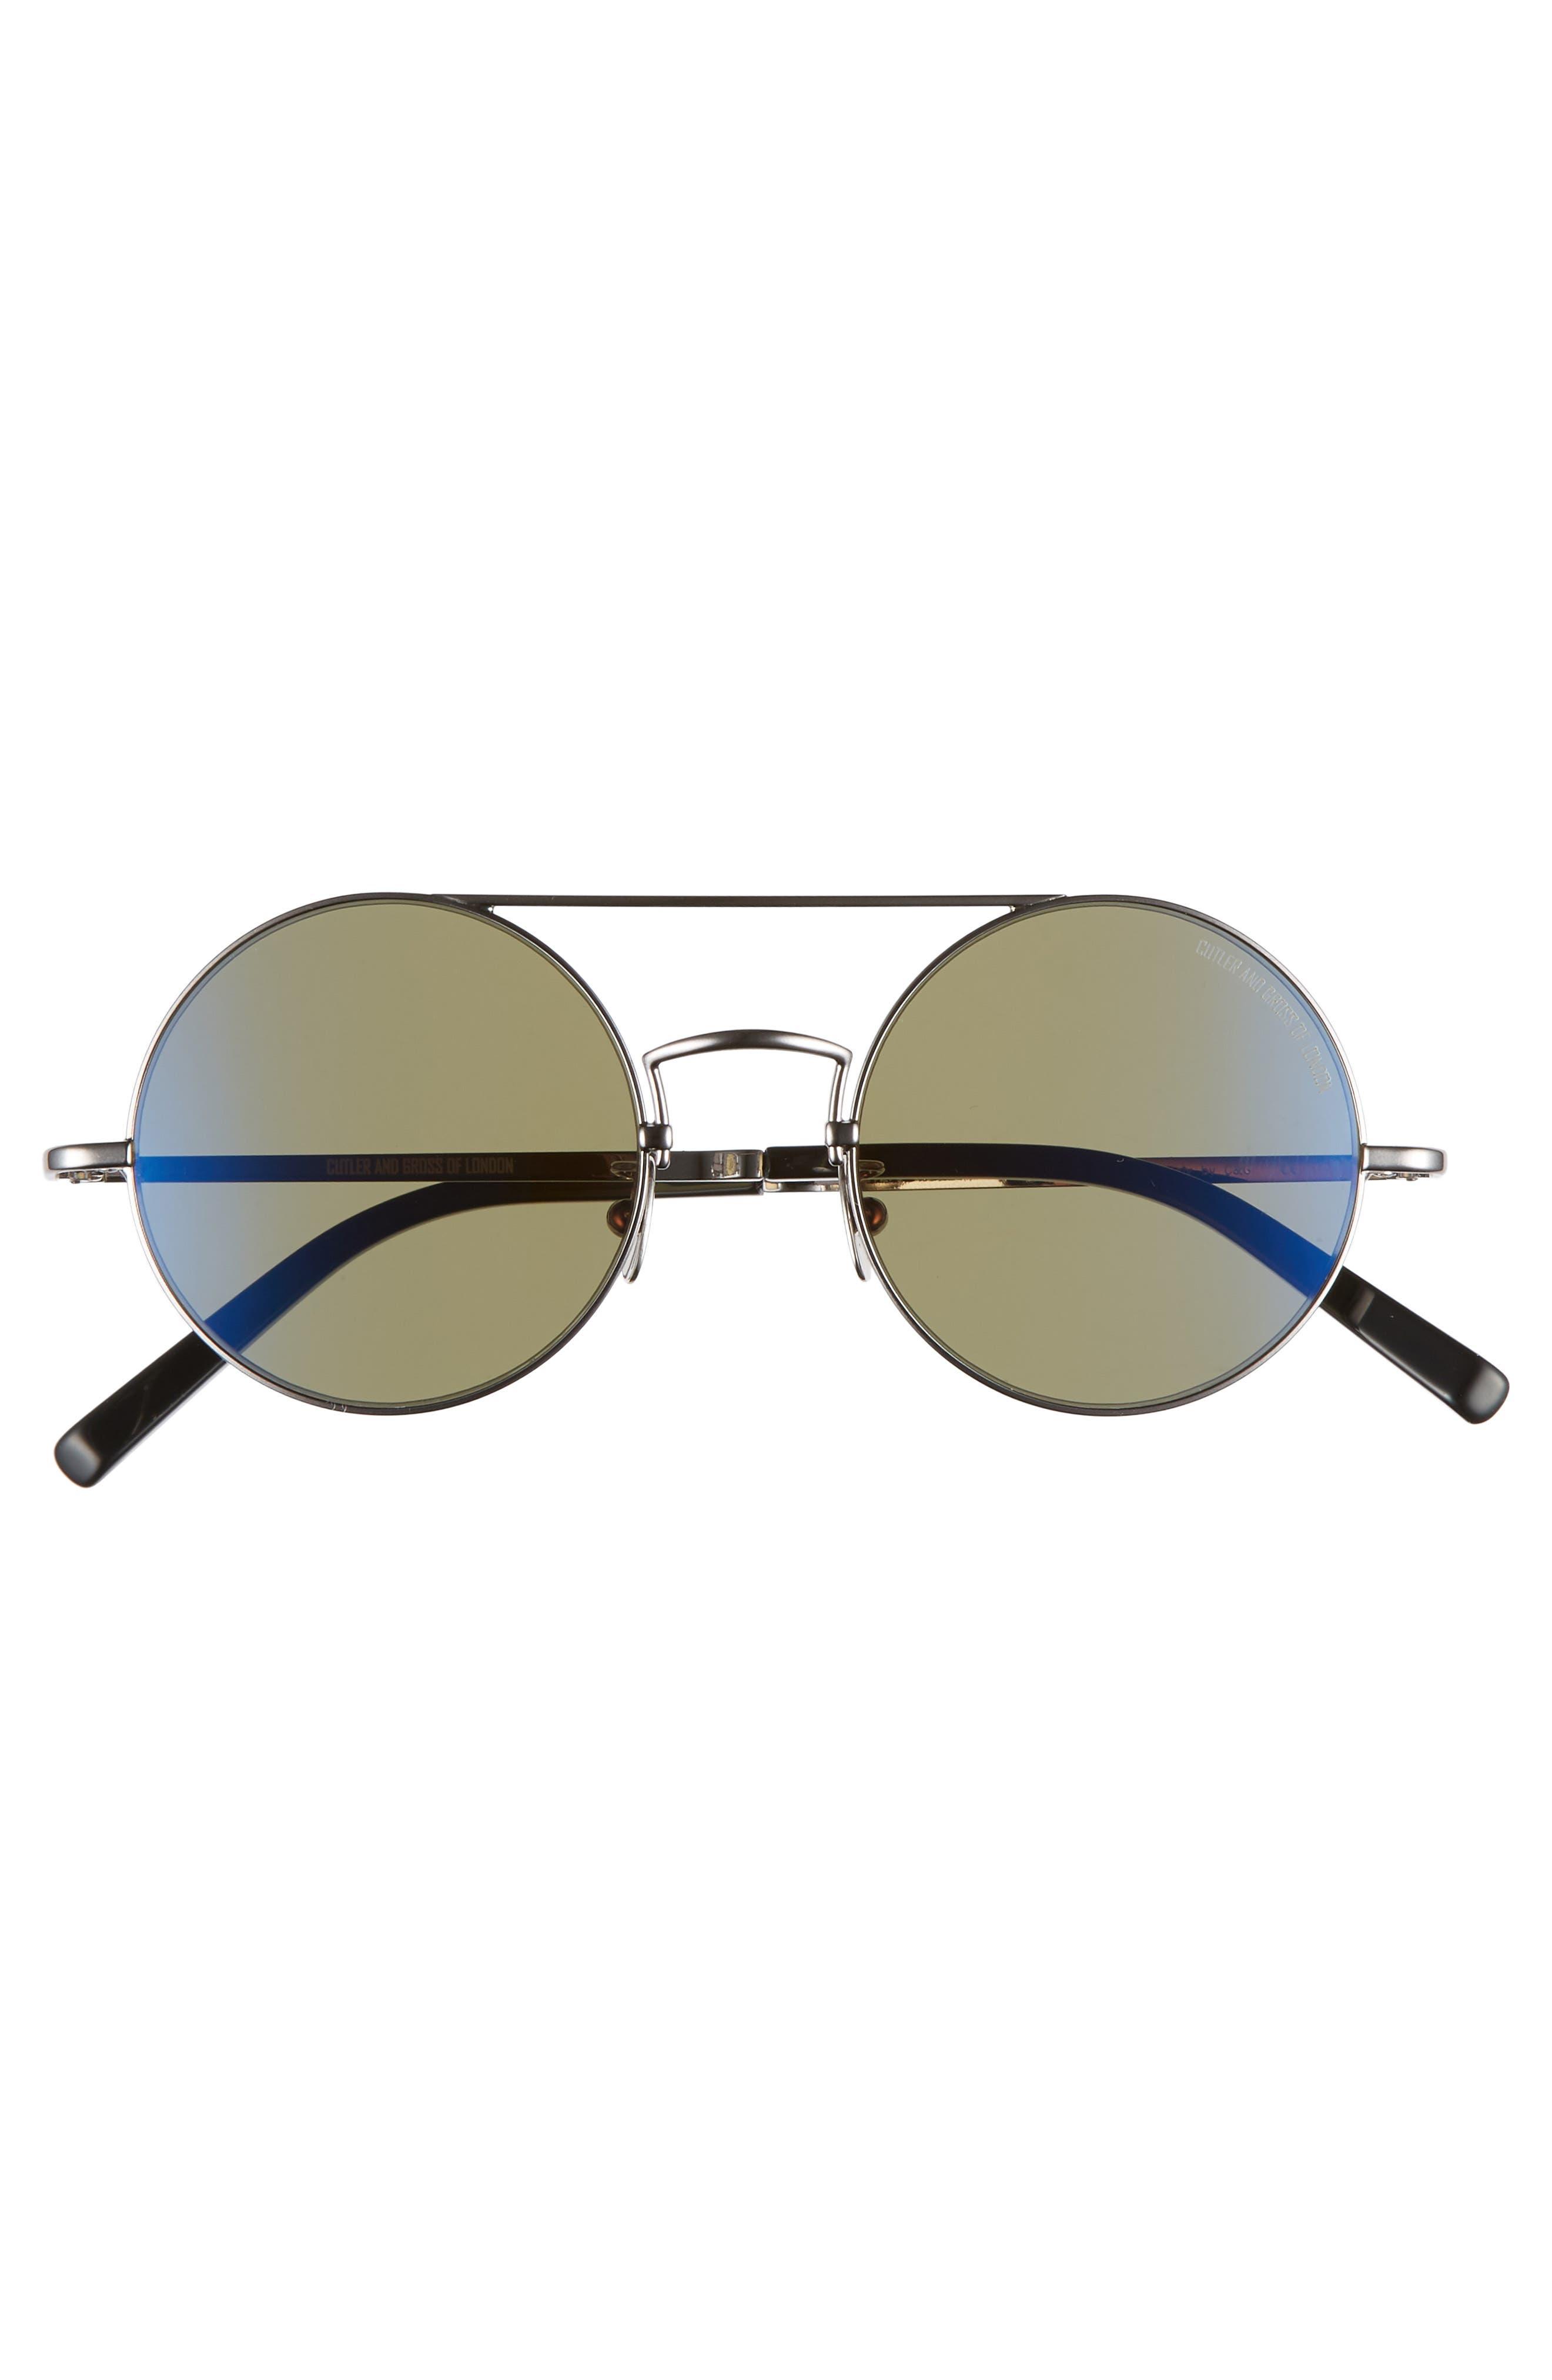 49mm Polarized Round Sunglasses,                             Alternate thumbnail 2, color,                             RUTHENIUM METAL/ DARK GREEN